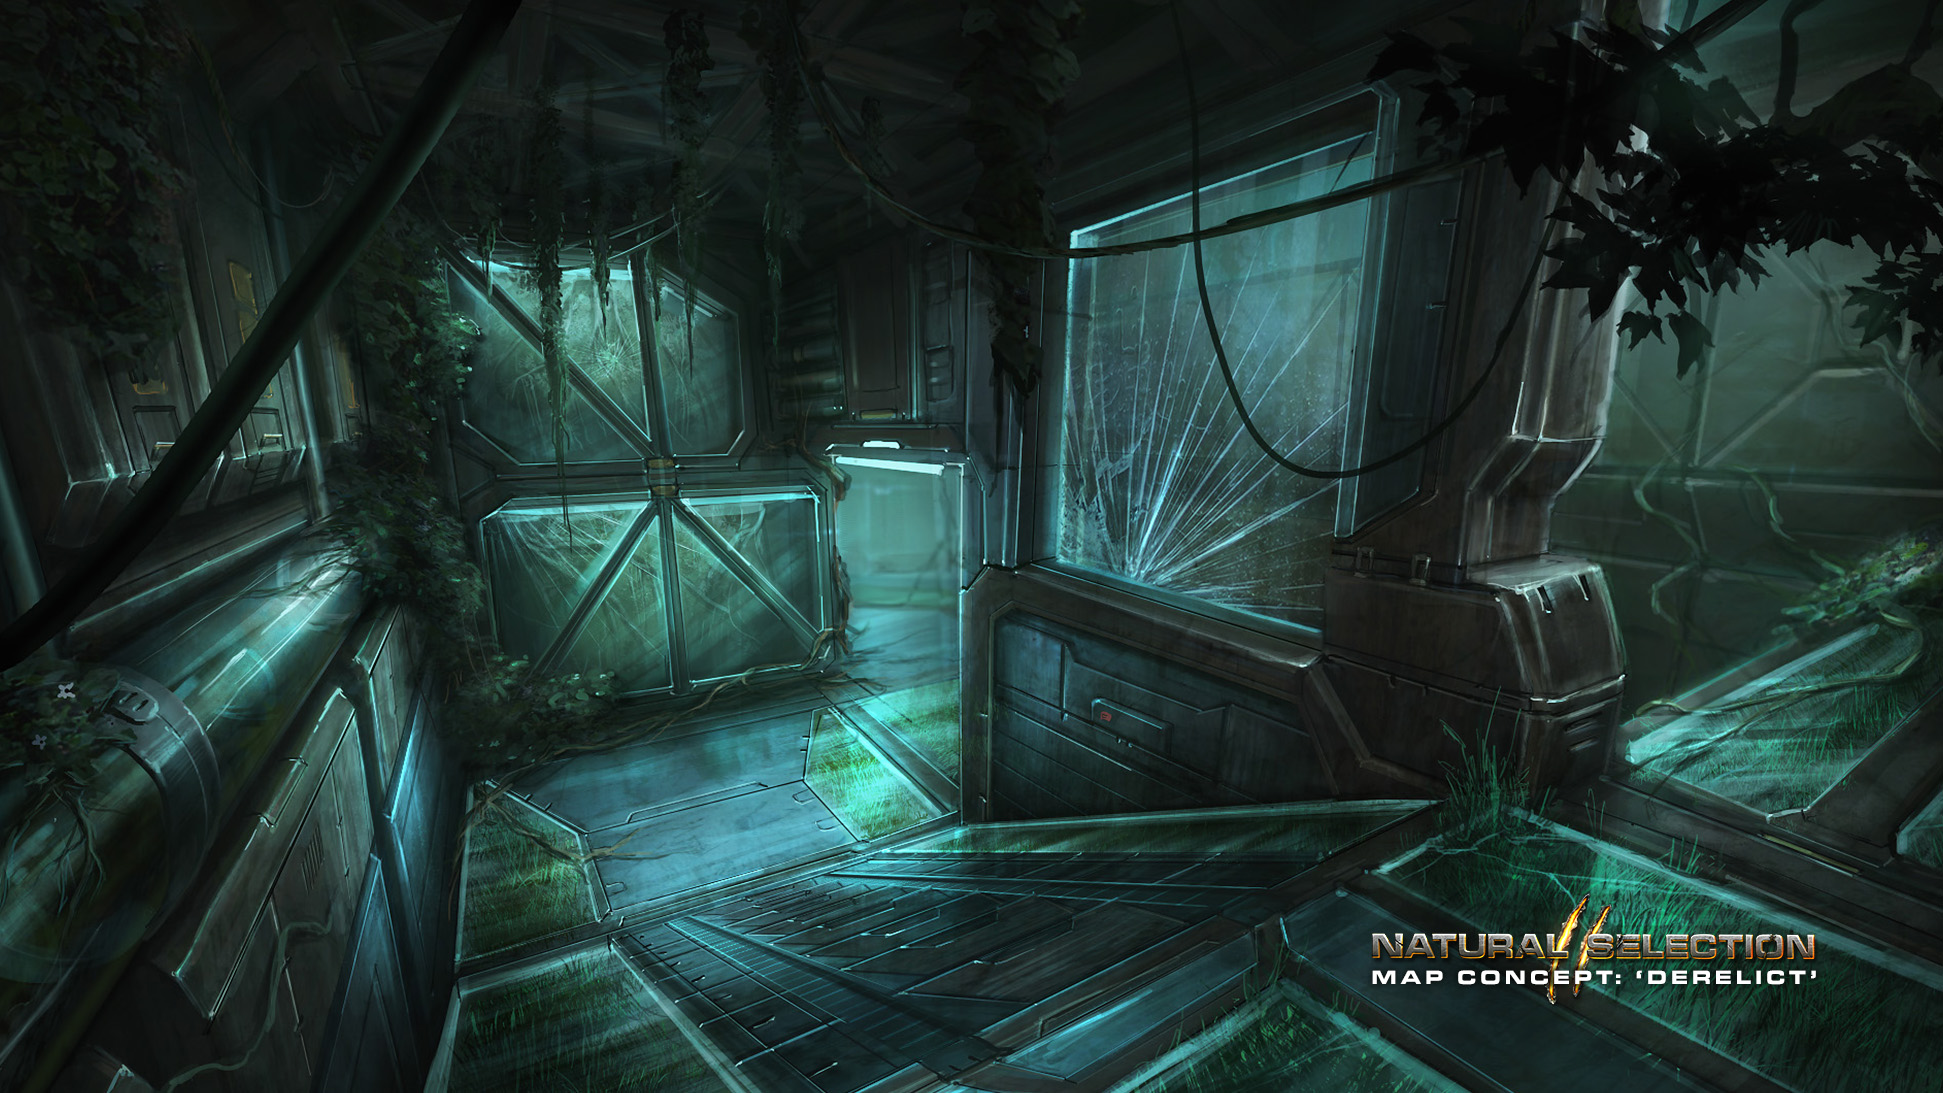 Gravity Falls Landscapes Wallpaper Ns2 Map Asset Release Derelict Natural Selection 2